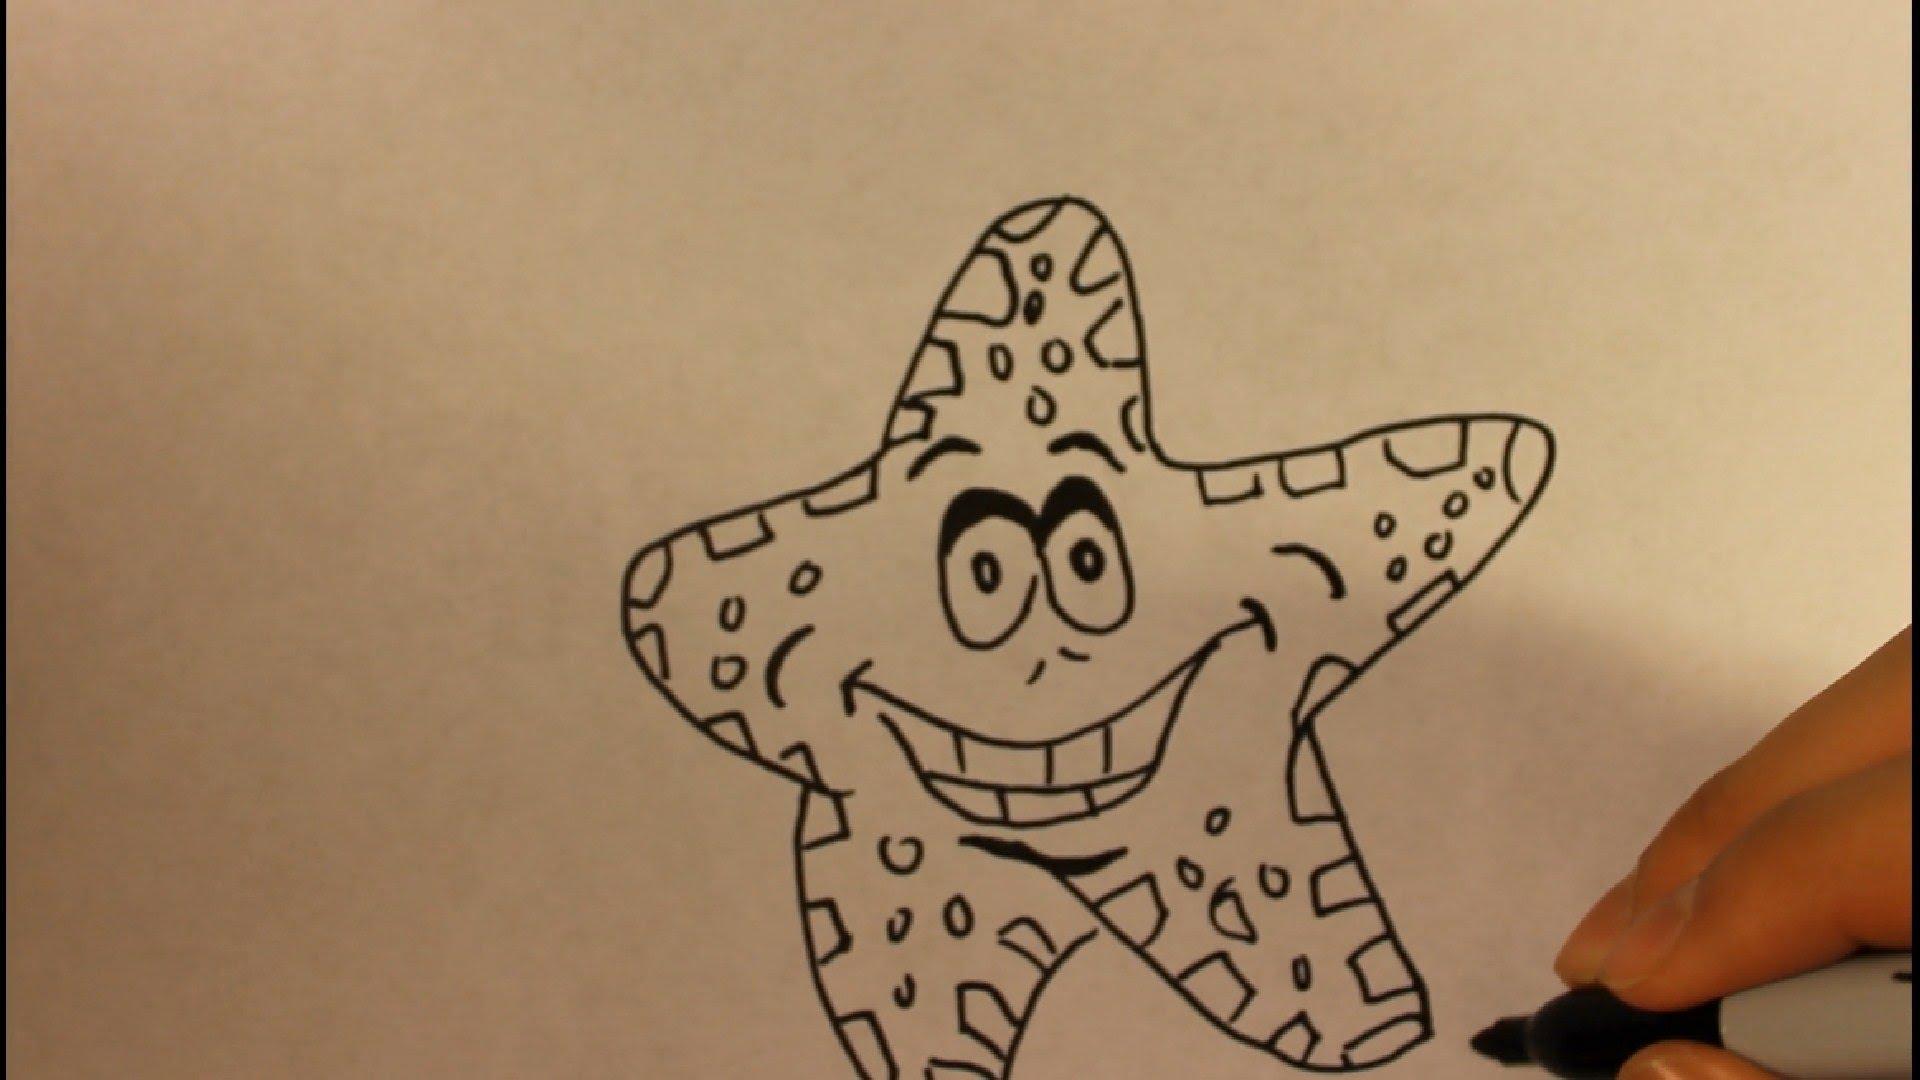 Drawn starfish animated Step Step Draw For Step